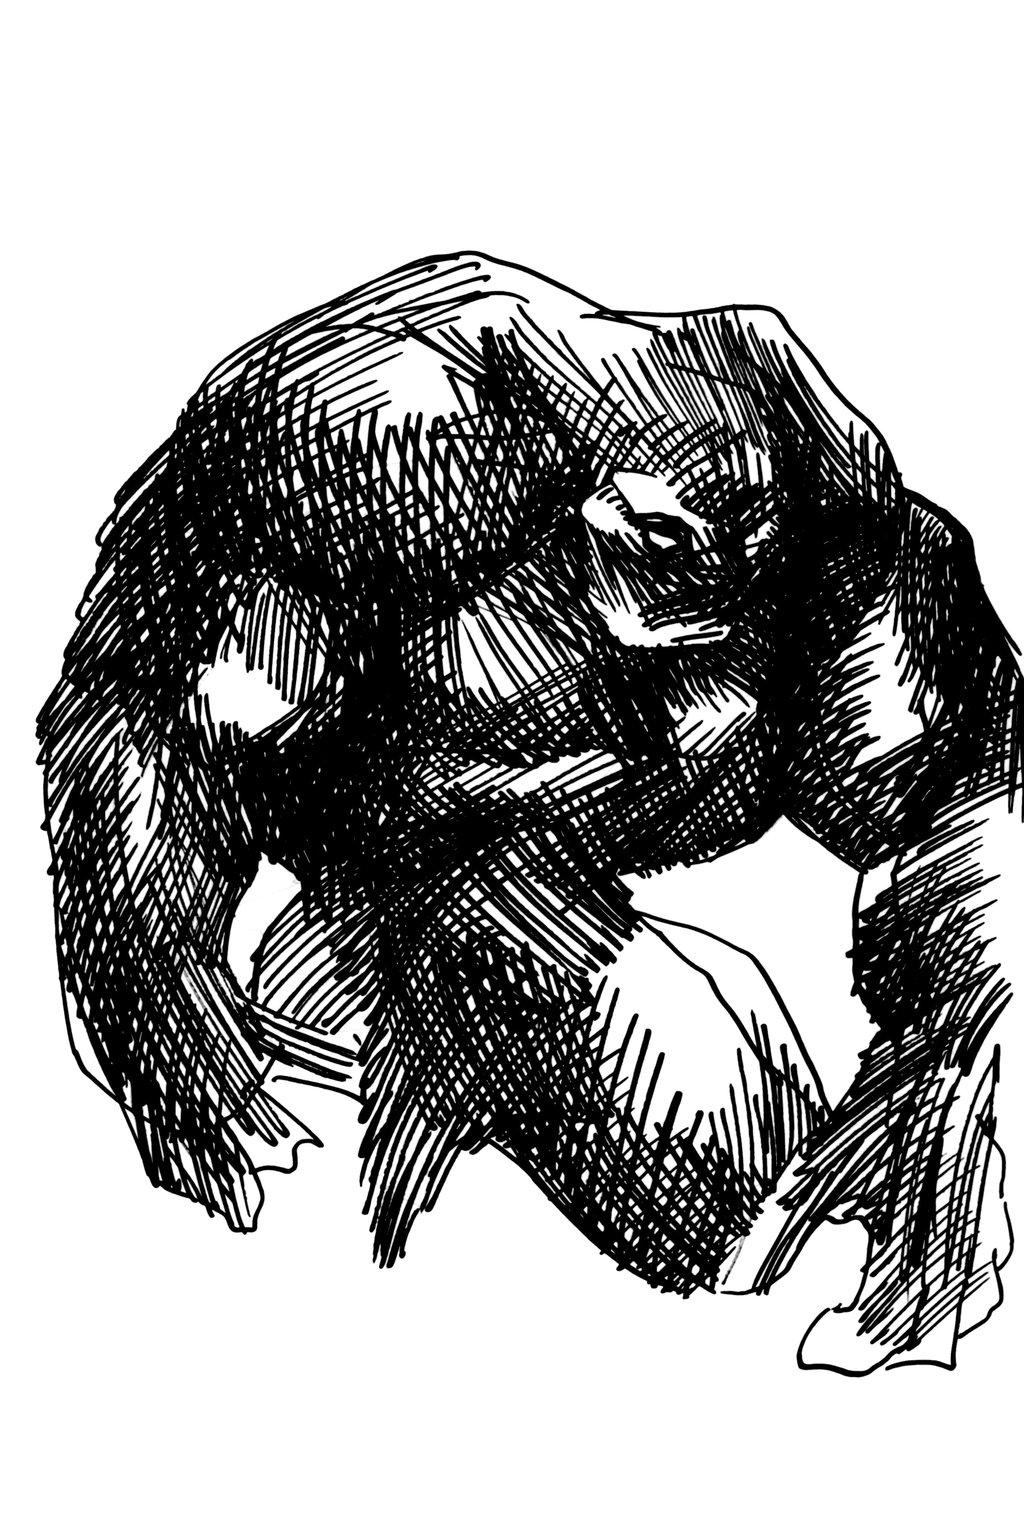 1024x1536 Alien Cross Hatch Sketch By Tadashi Station